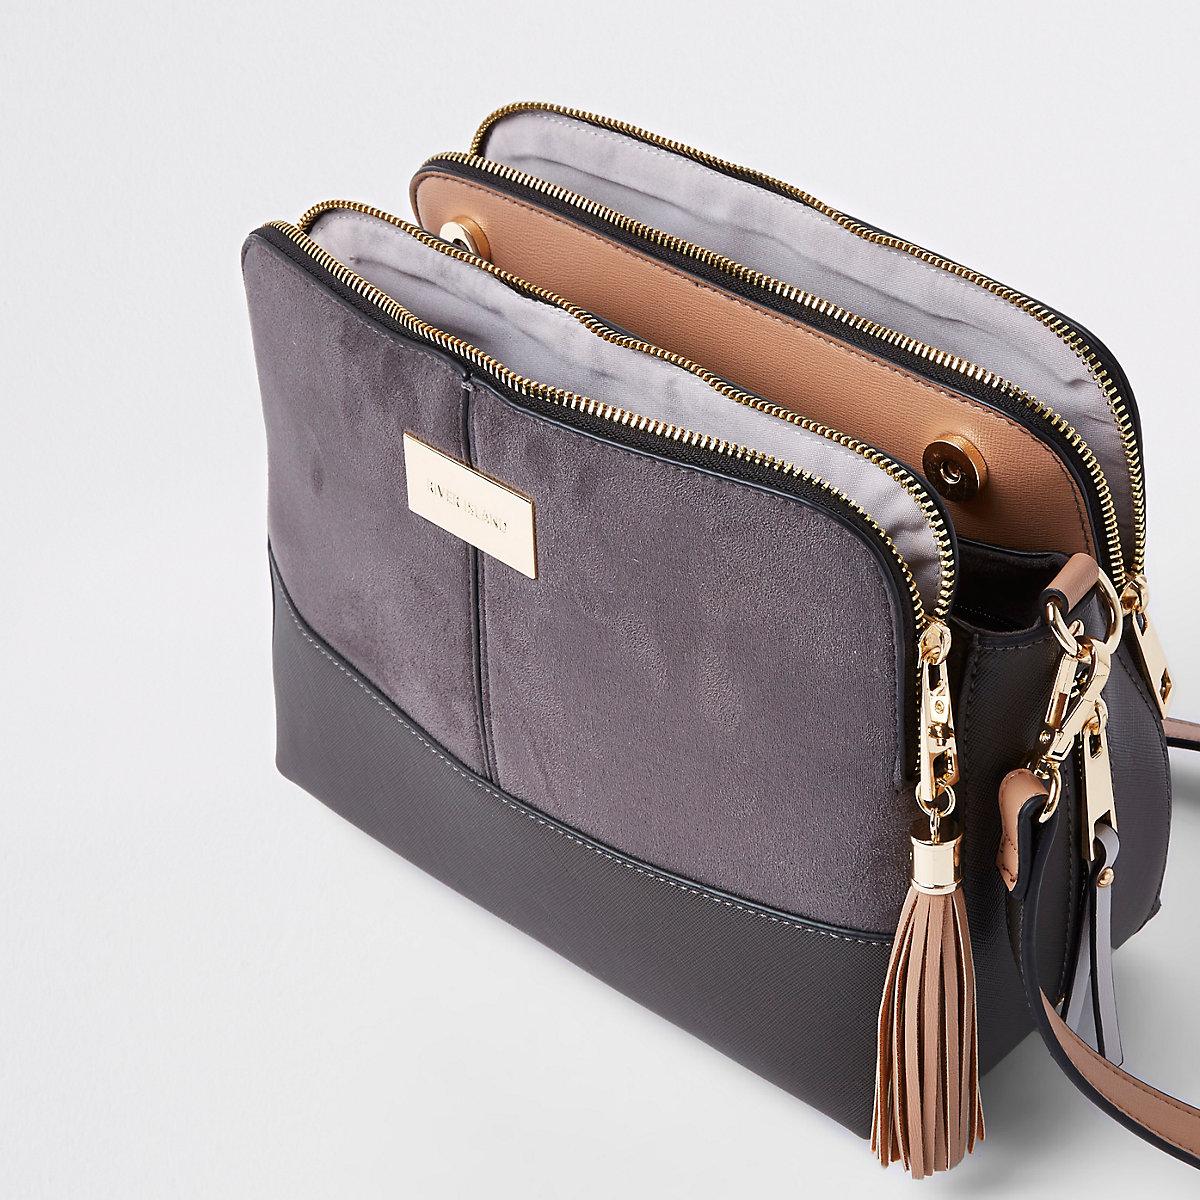 88b76e103856 Dark grey triple compartment cross body bag - Cross Body Bags - Bags ...